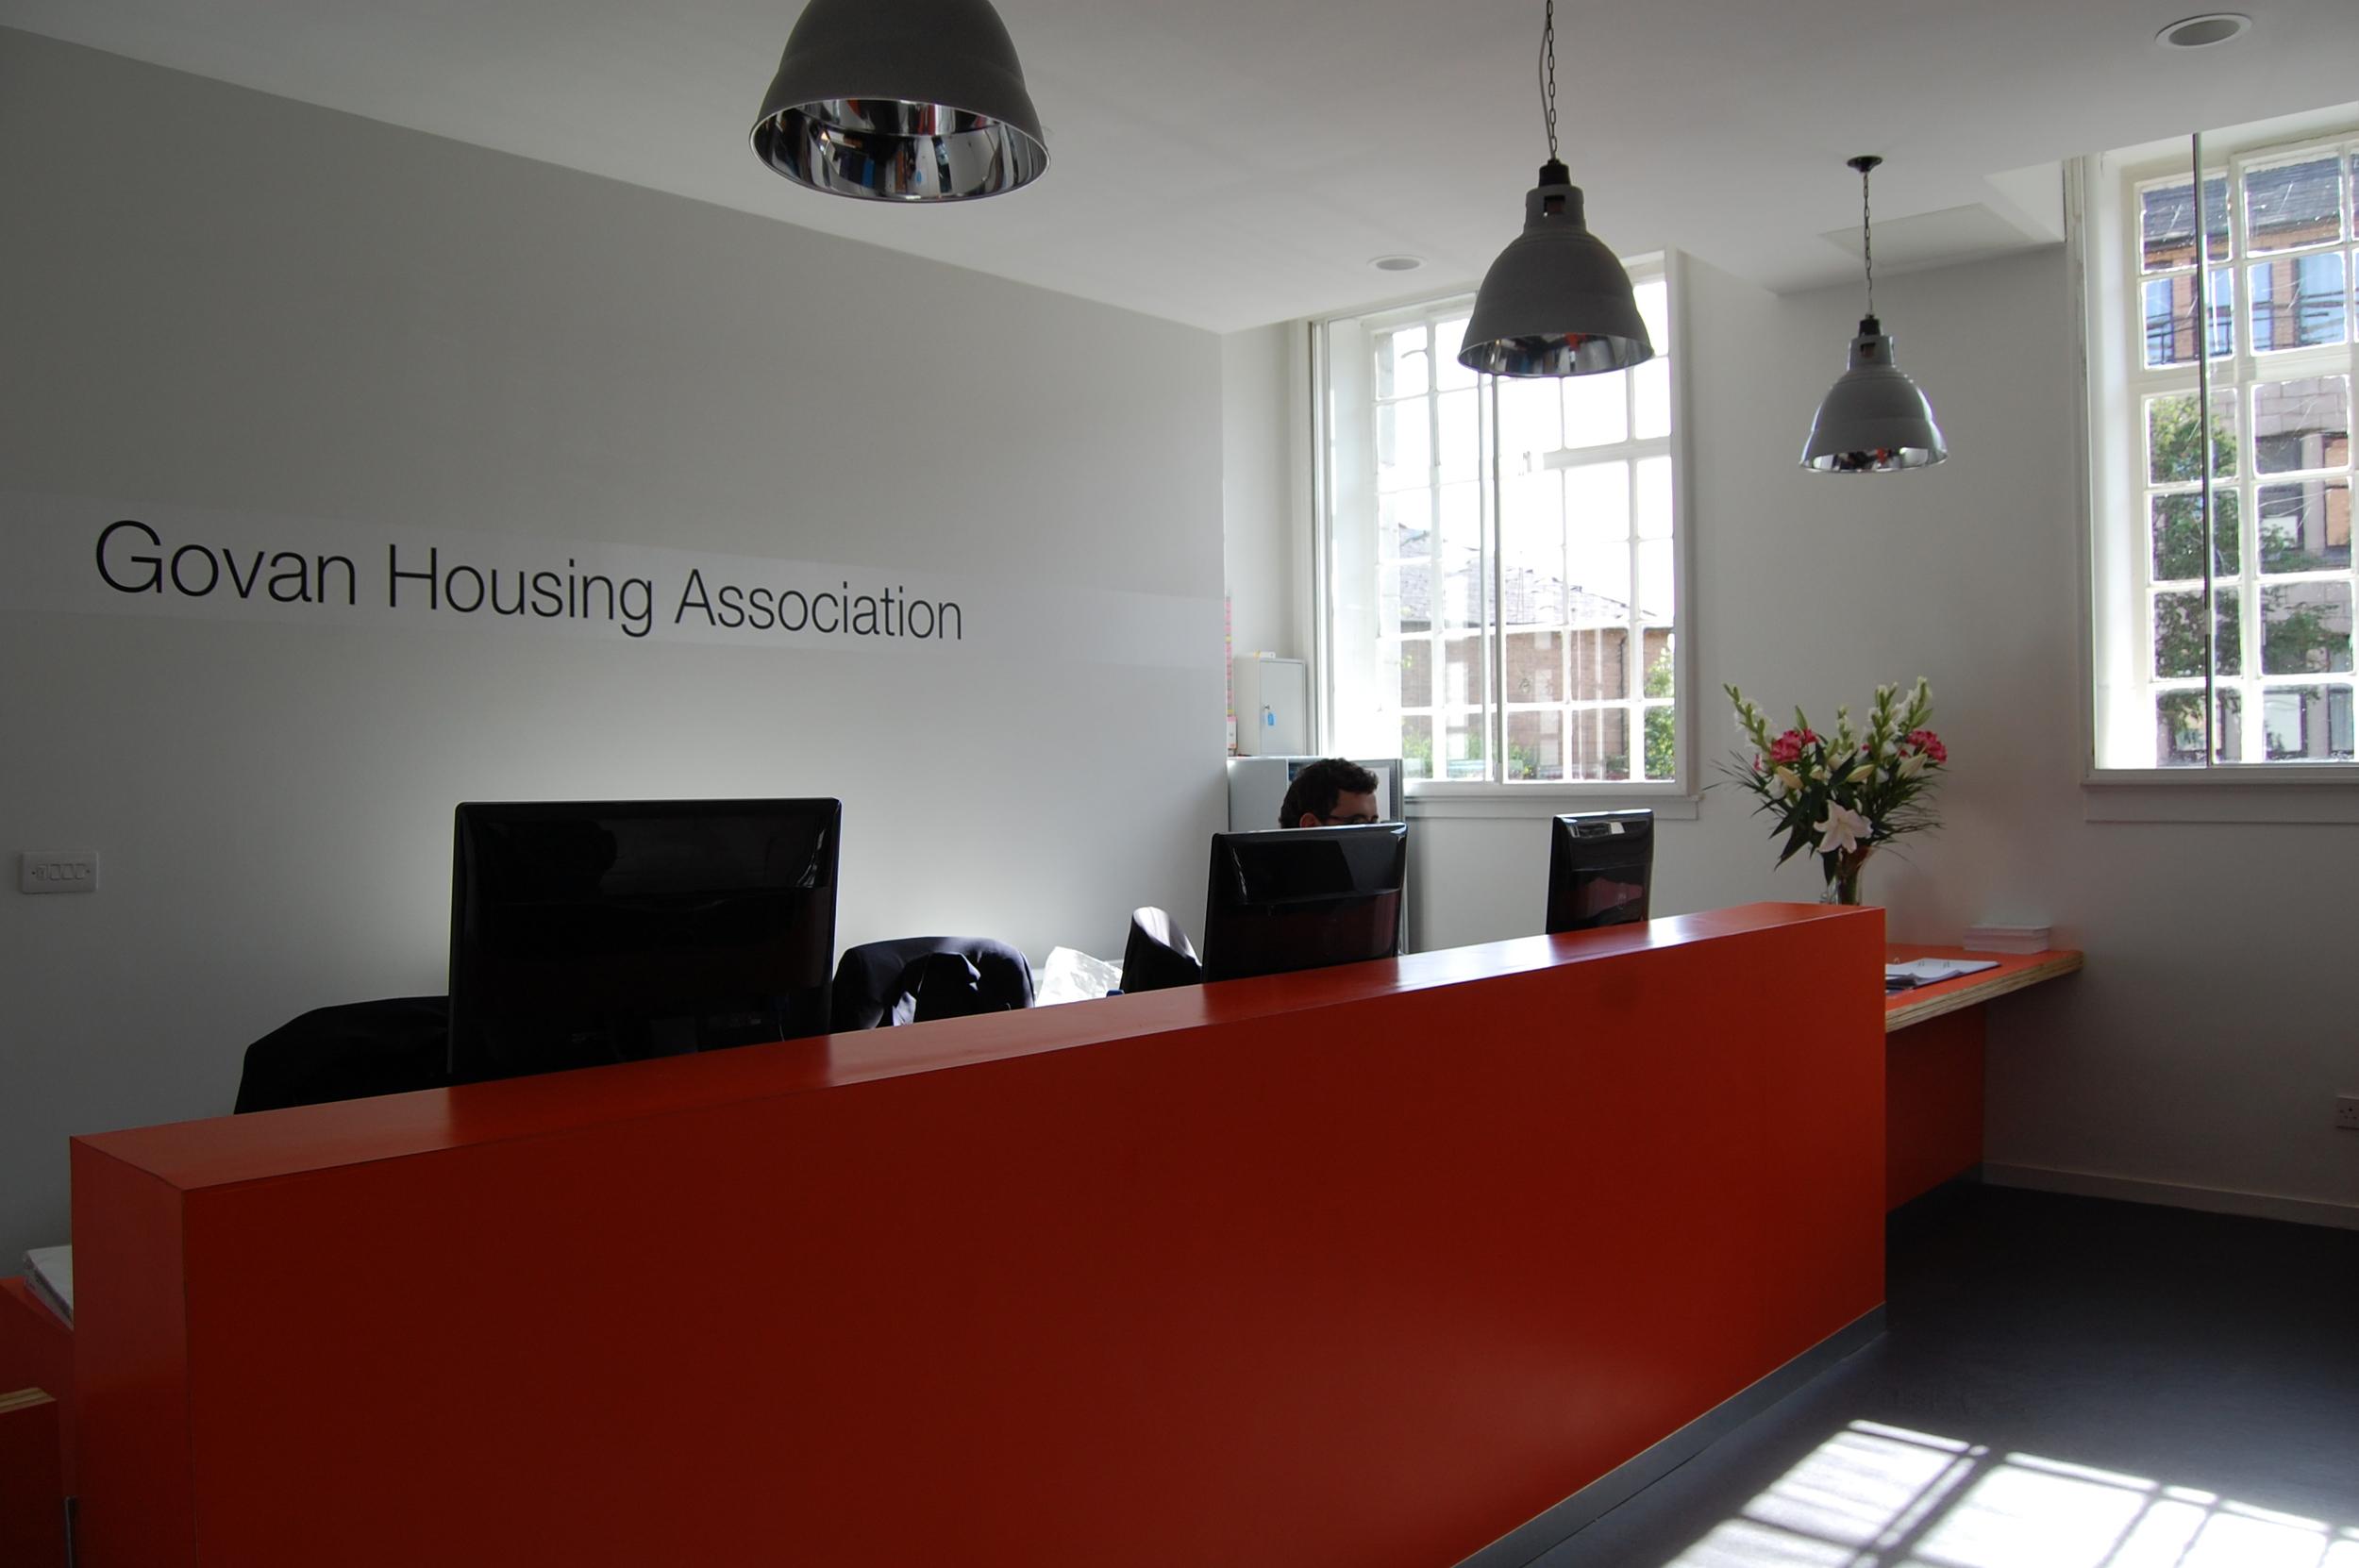 Govan Housing Association, Glasgow